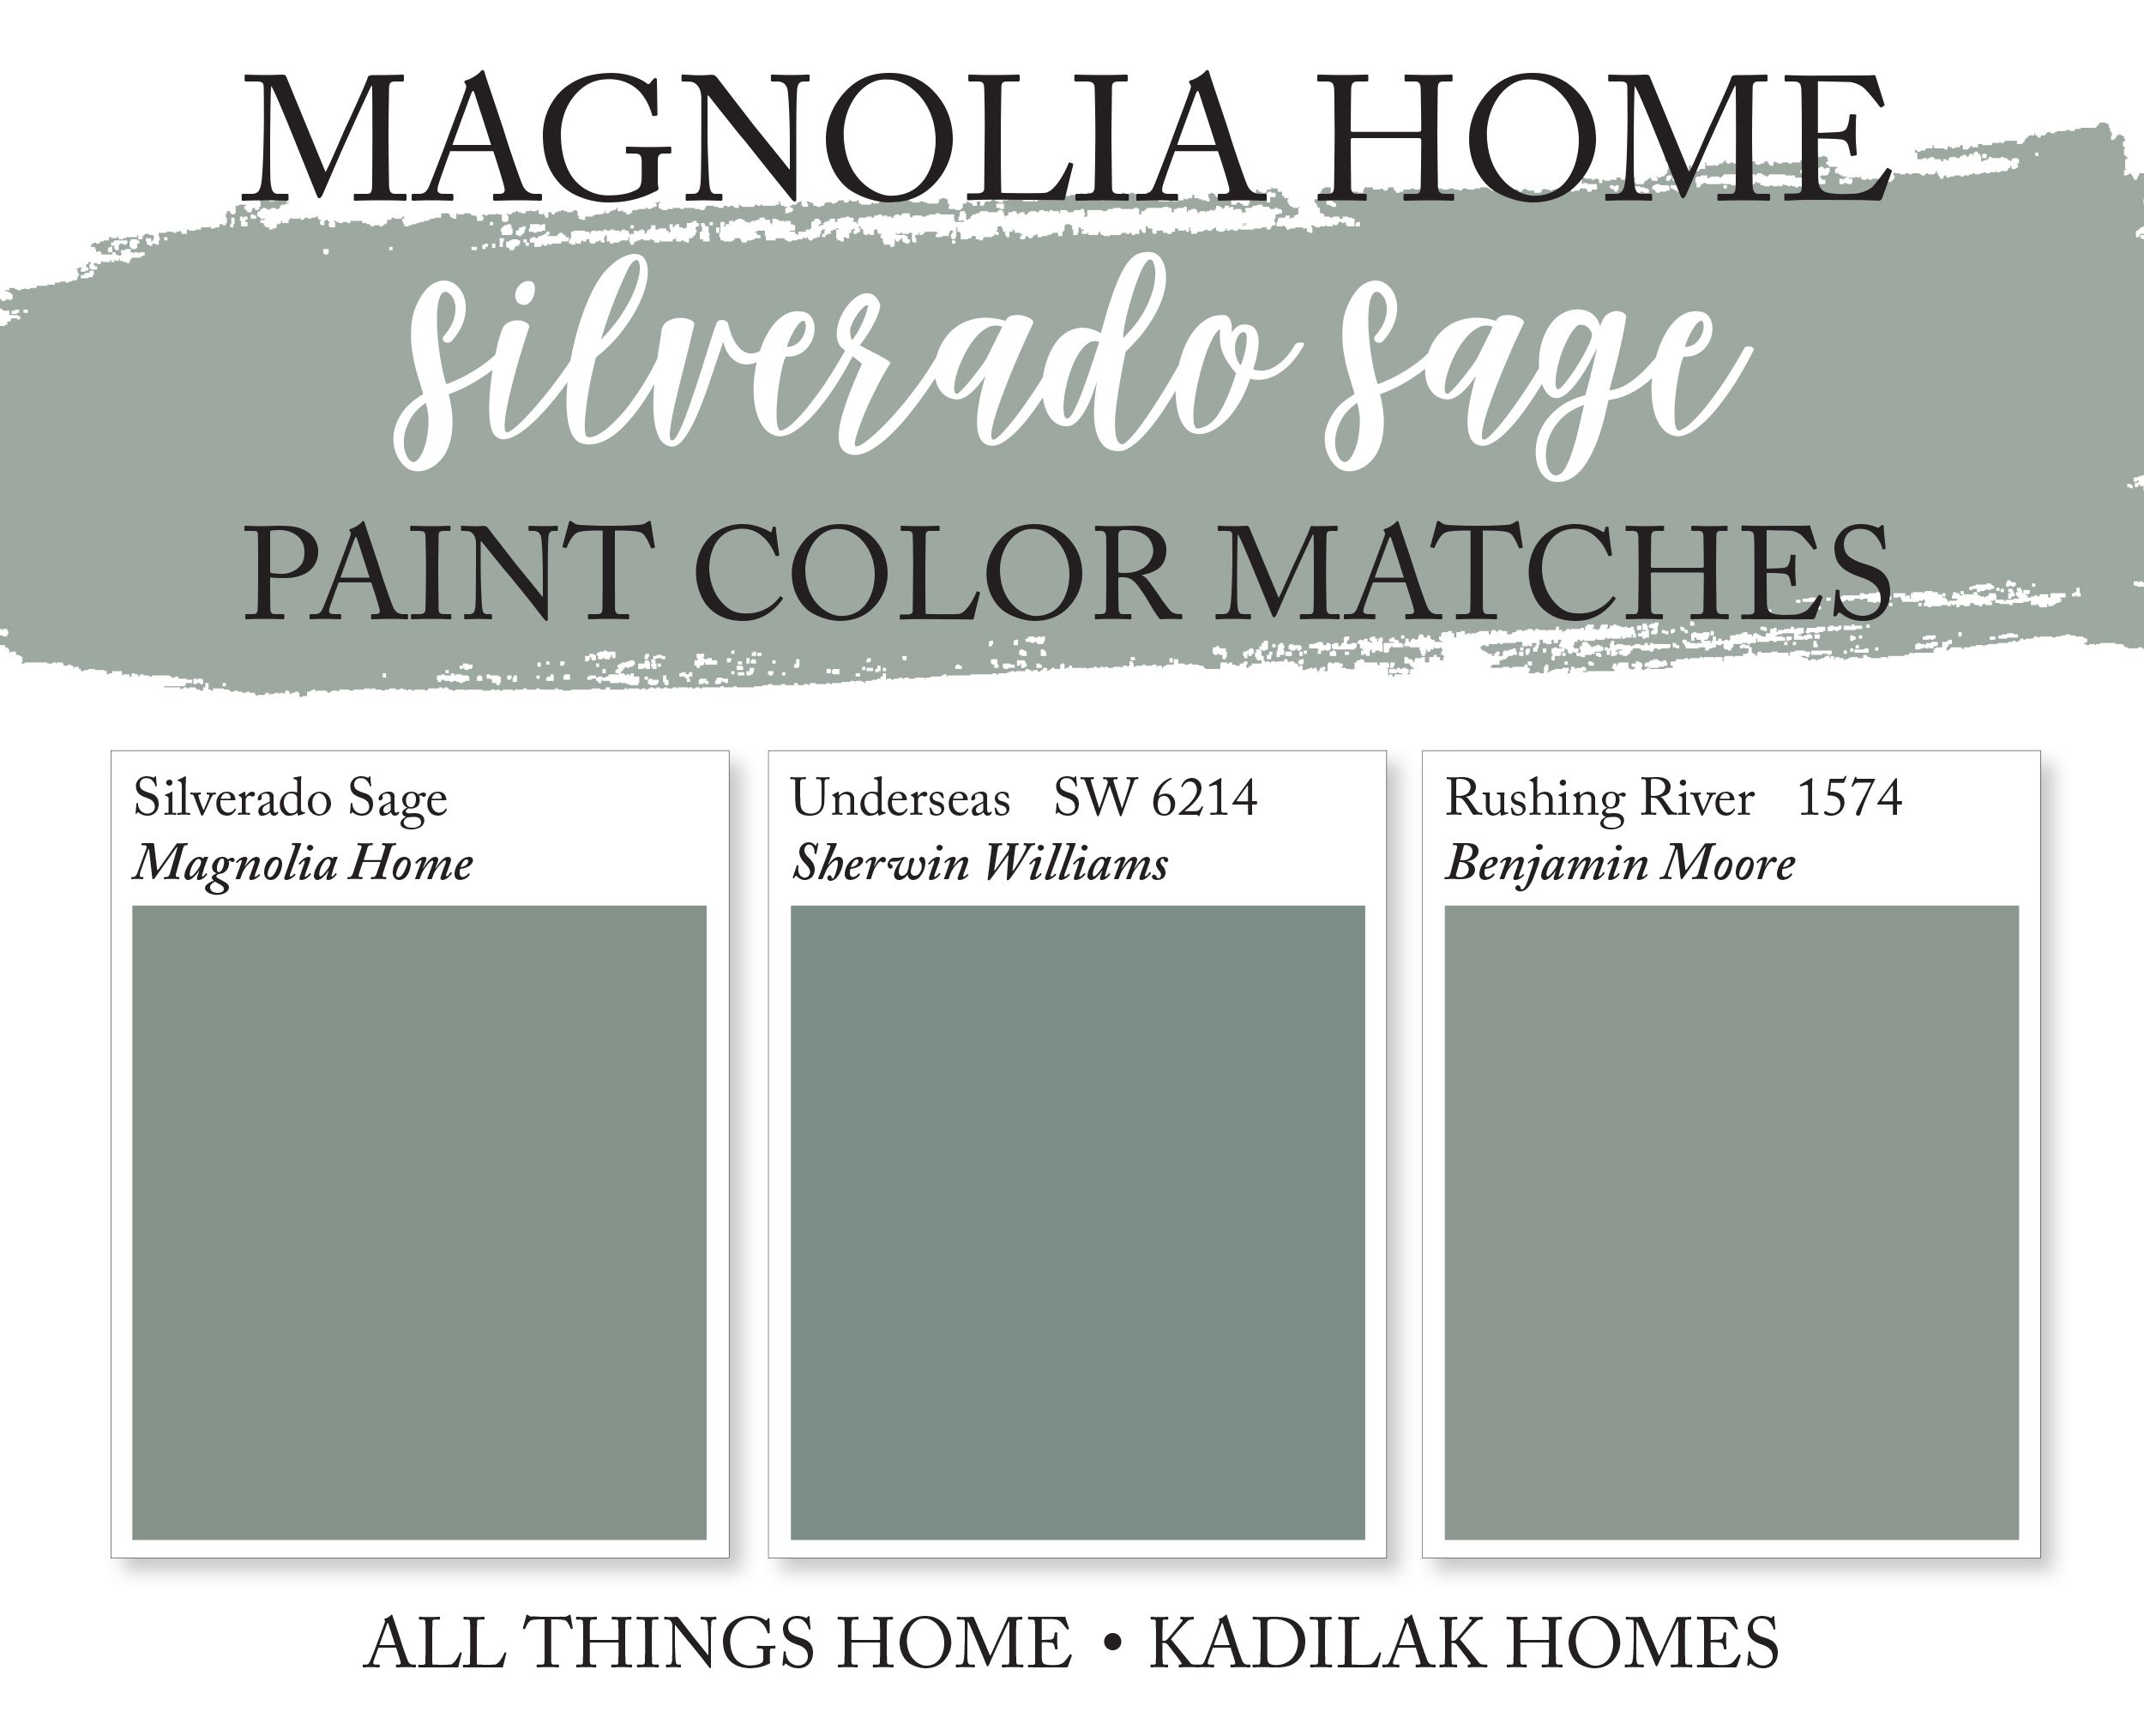 Magnolia Home Silverado Sage Paint Color Matches Matching Paint Colors Sage Paint Color Sherwin Williams Paint Colors Green